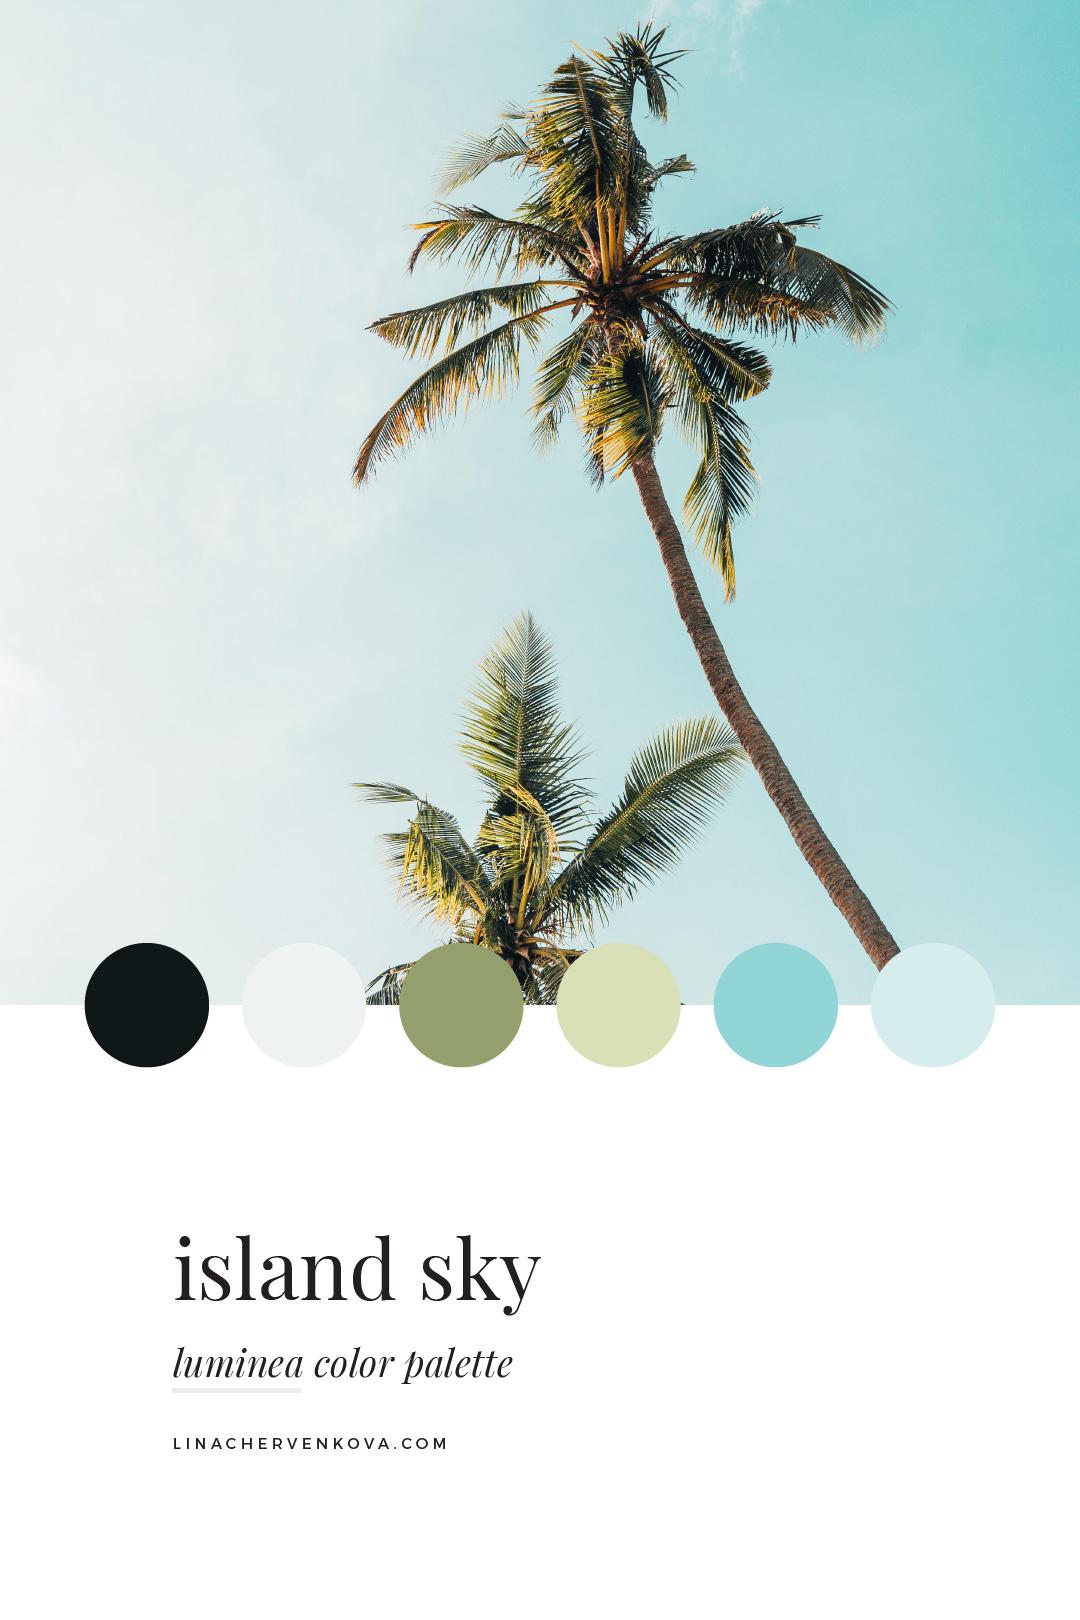 luminea-color-palette-1.jpg